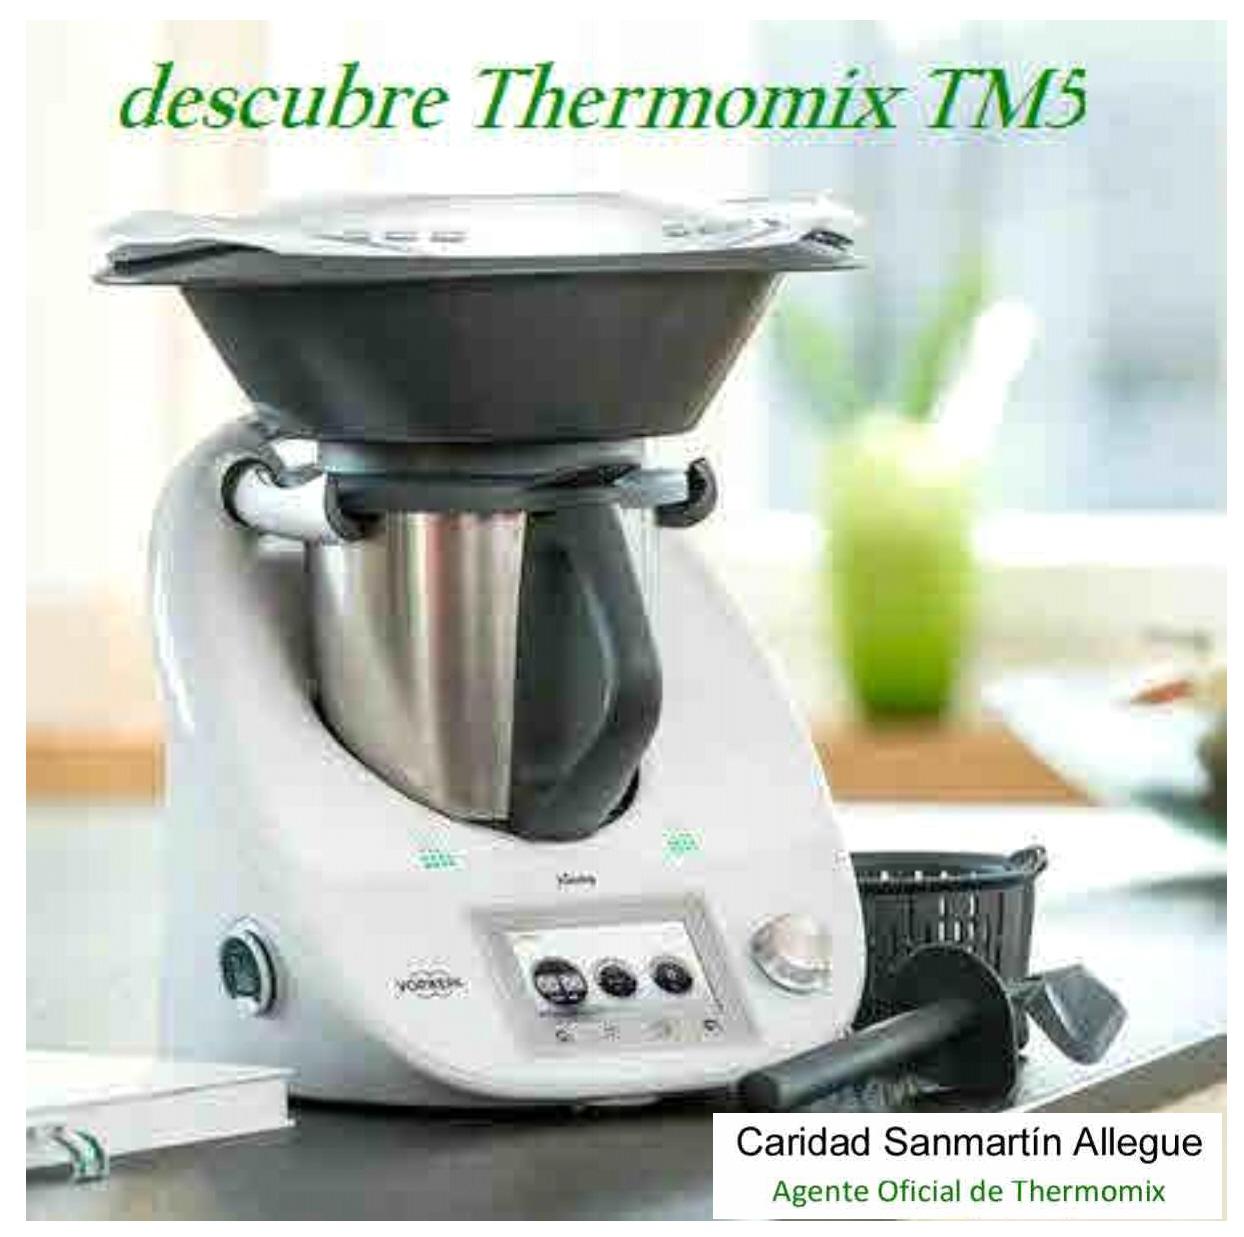 NUEVO Thermomix® TM5, DESCÚBRELO ESTE VERANO